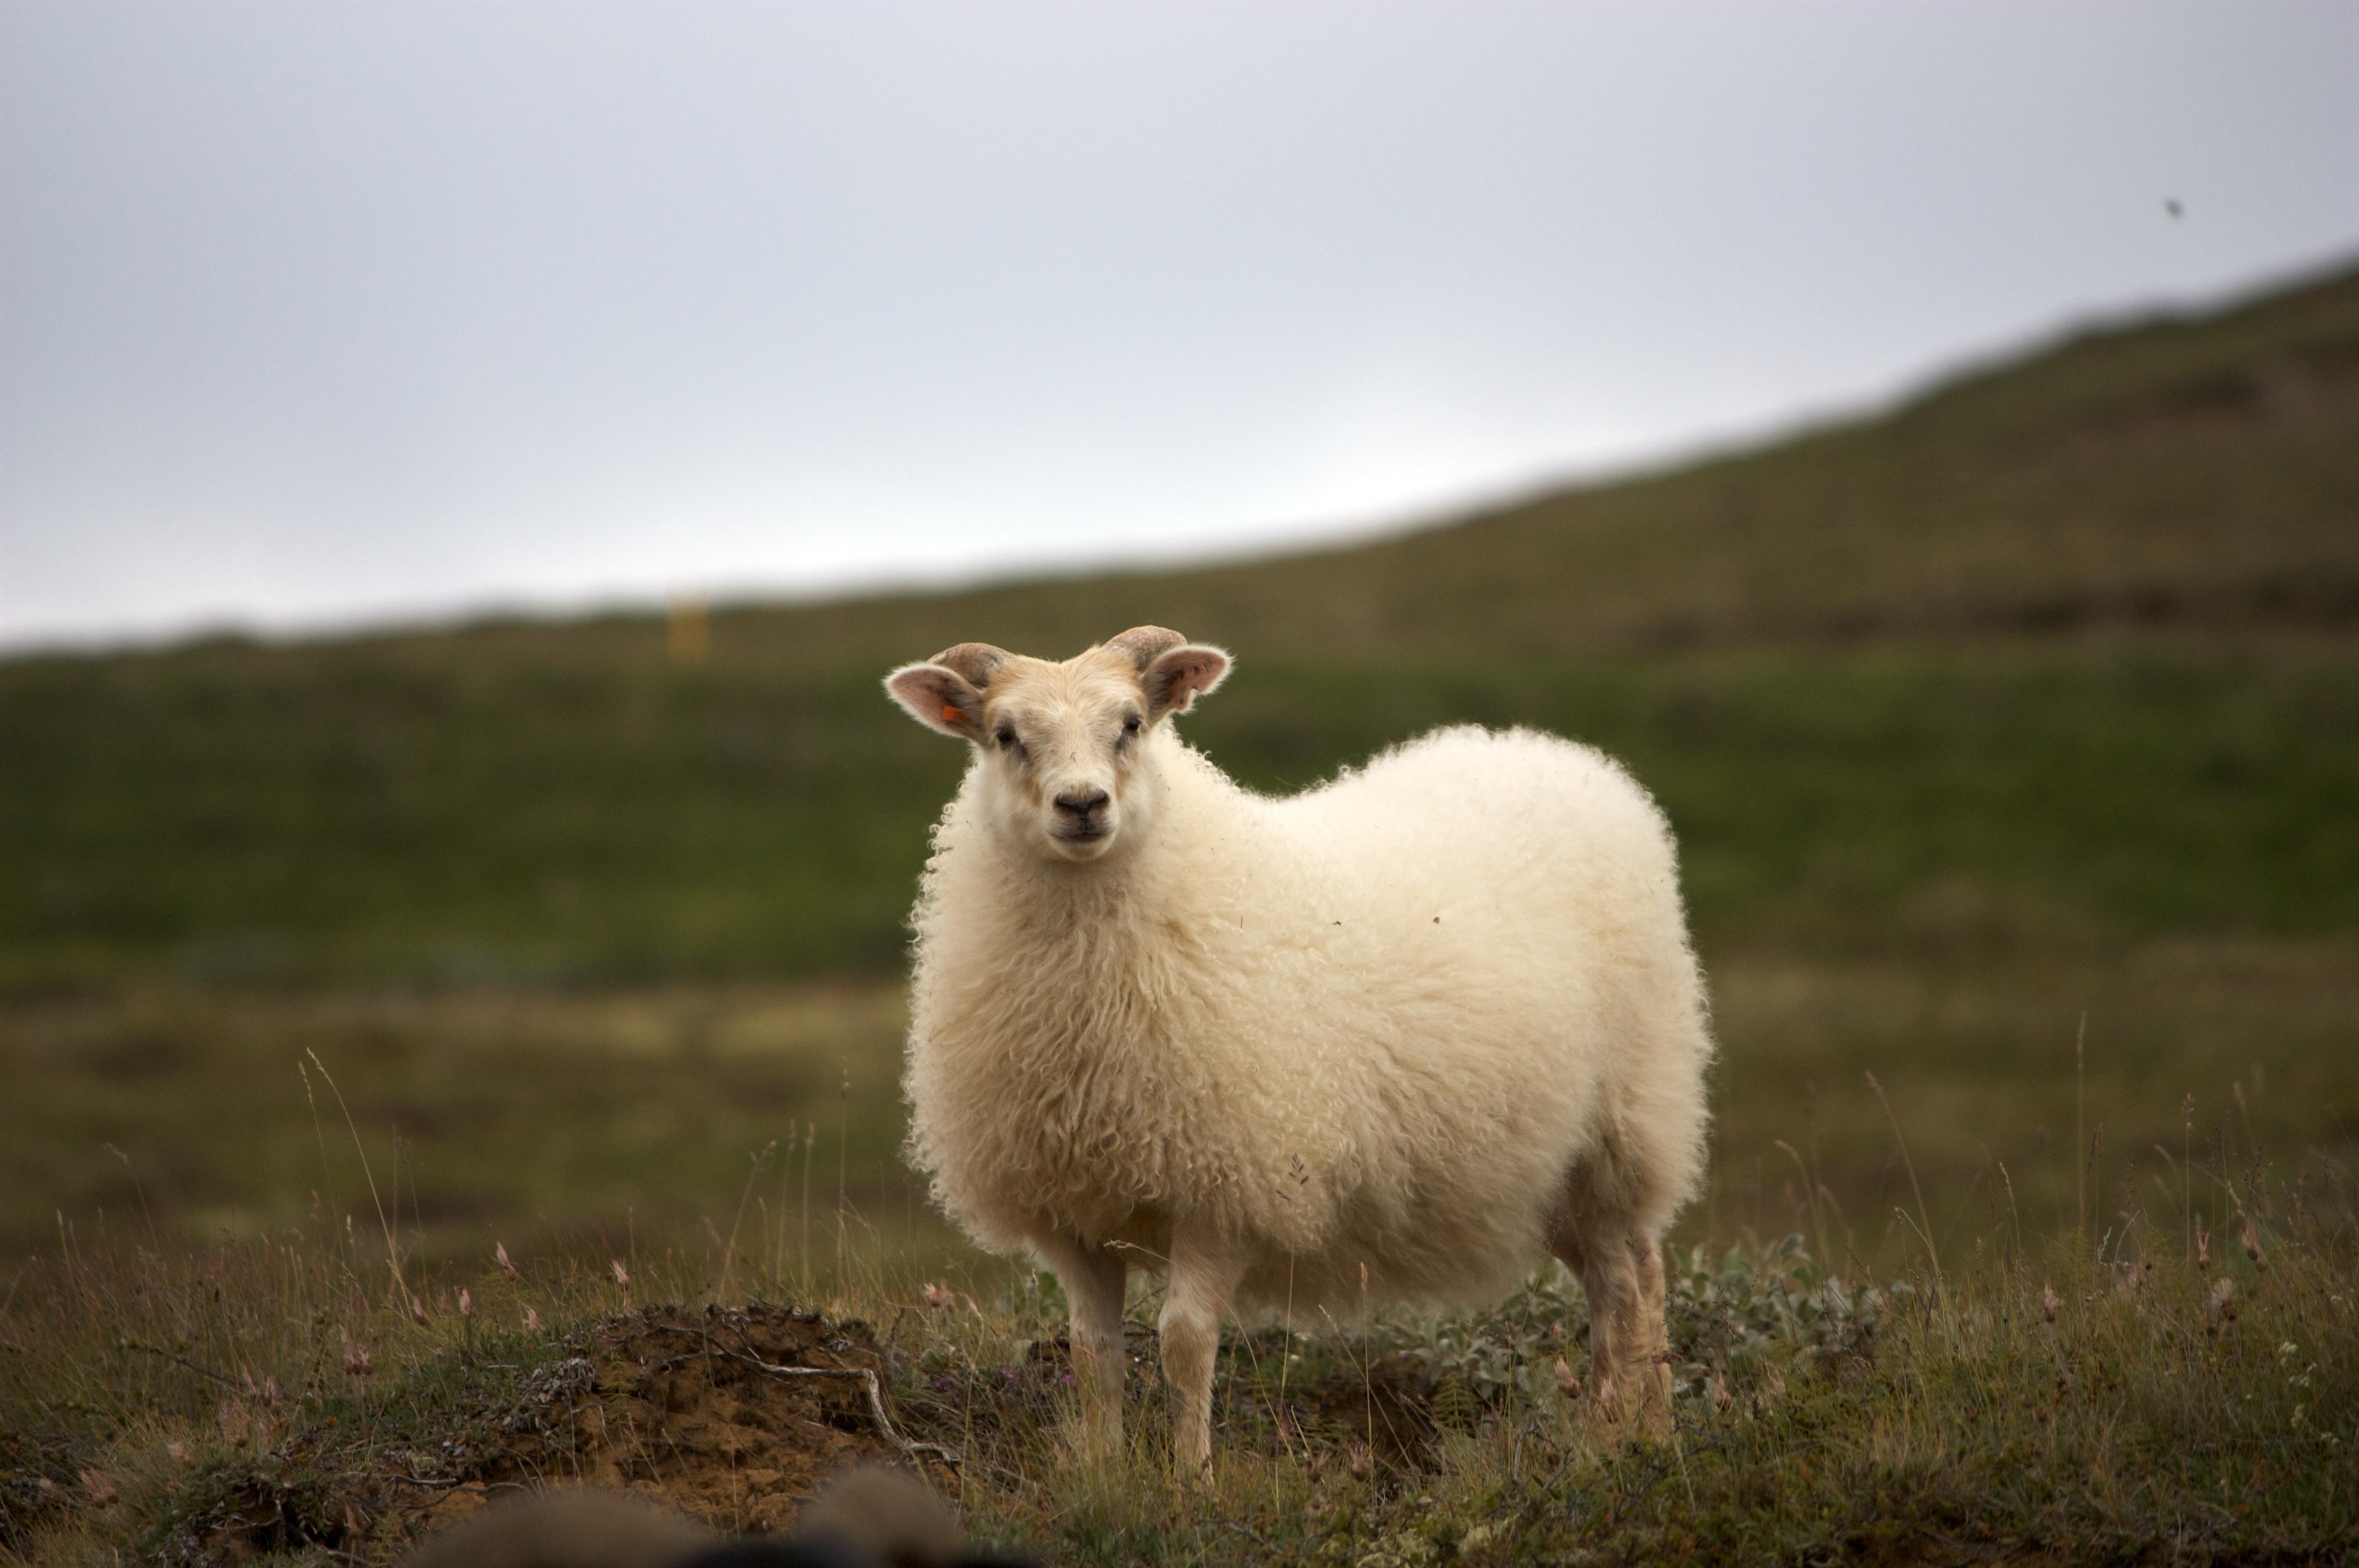 White sheep - photo#8